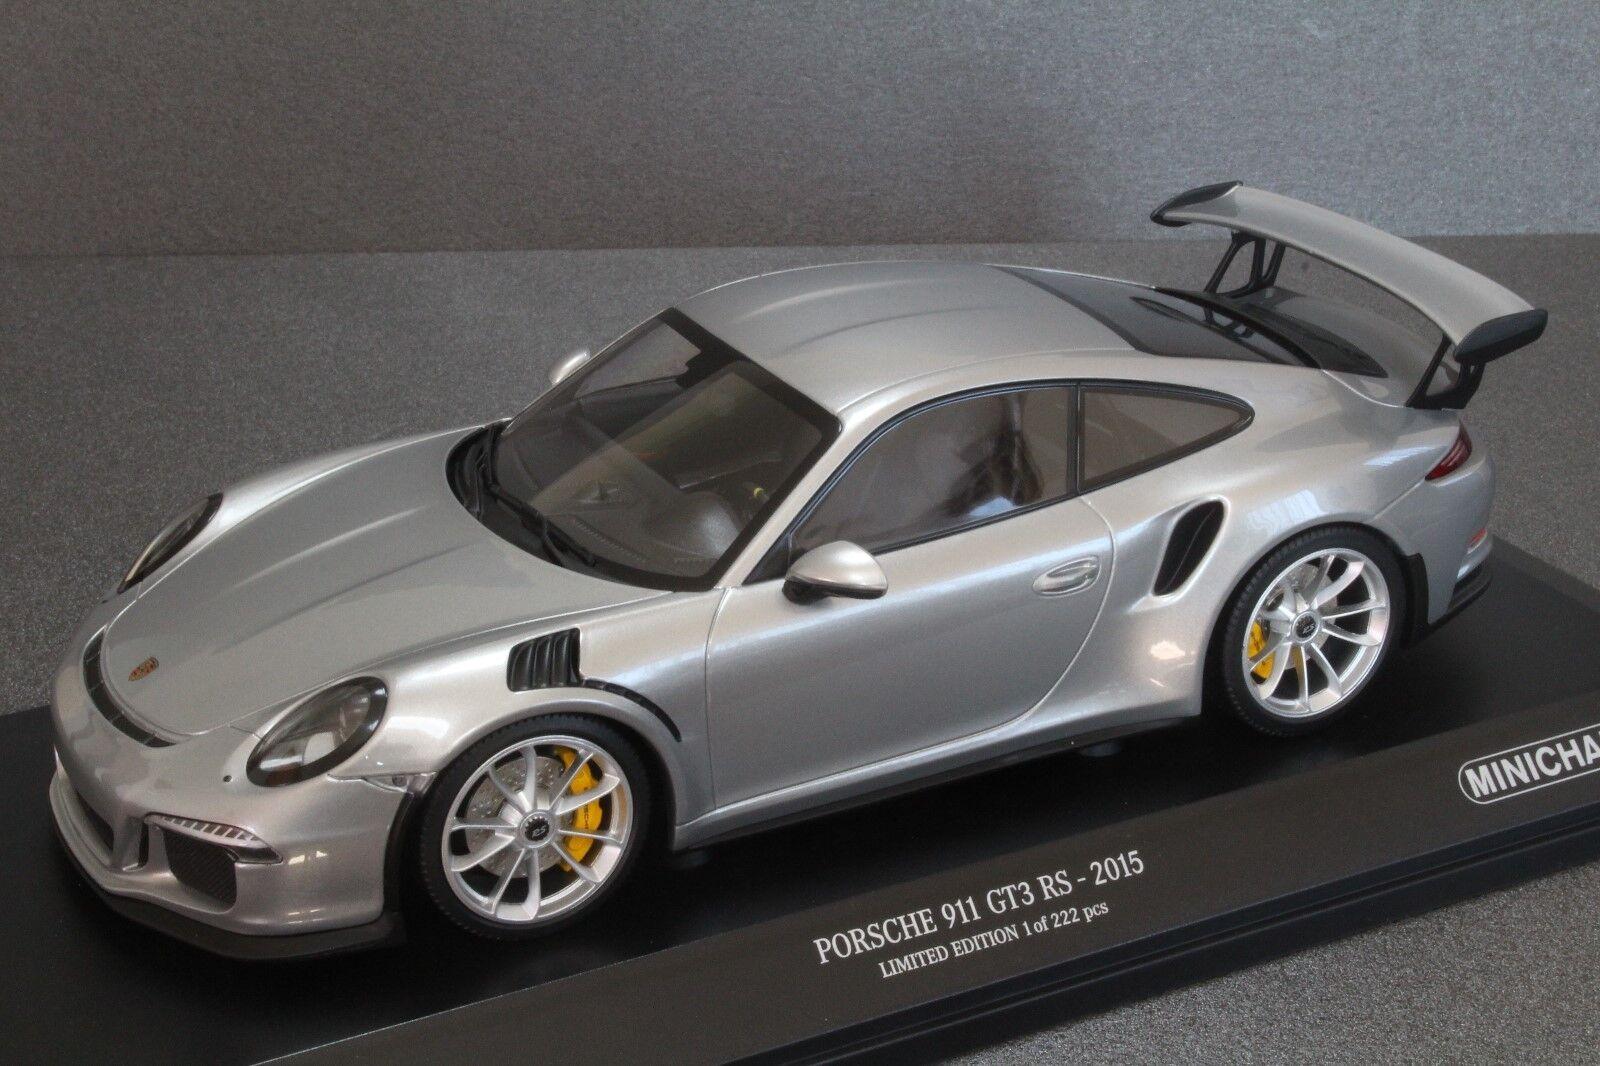 MINICHAMPS 1:18 PORSCHE 911 GT3 RS 2015  Ref: 192